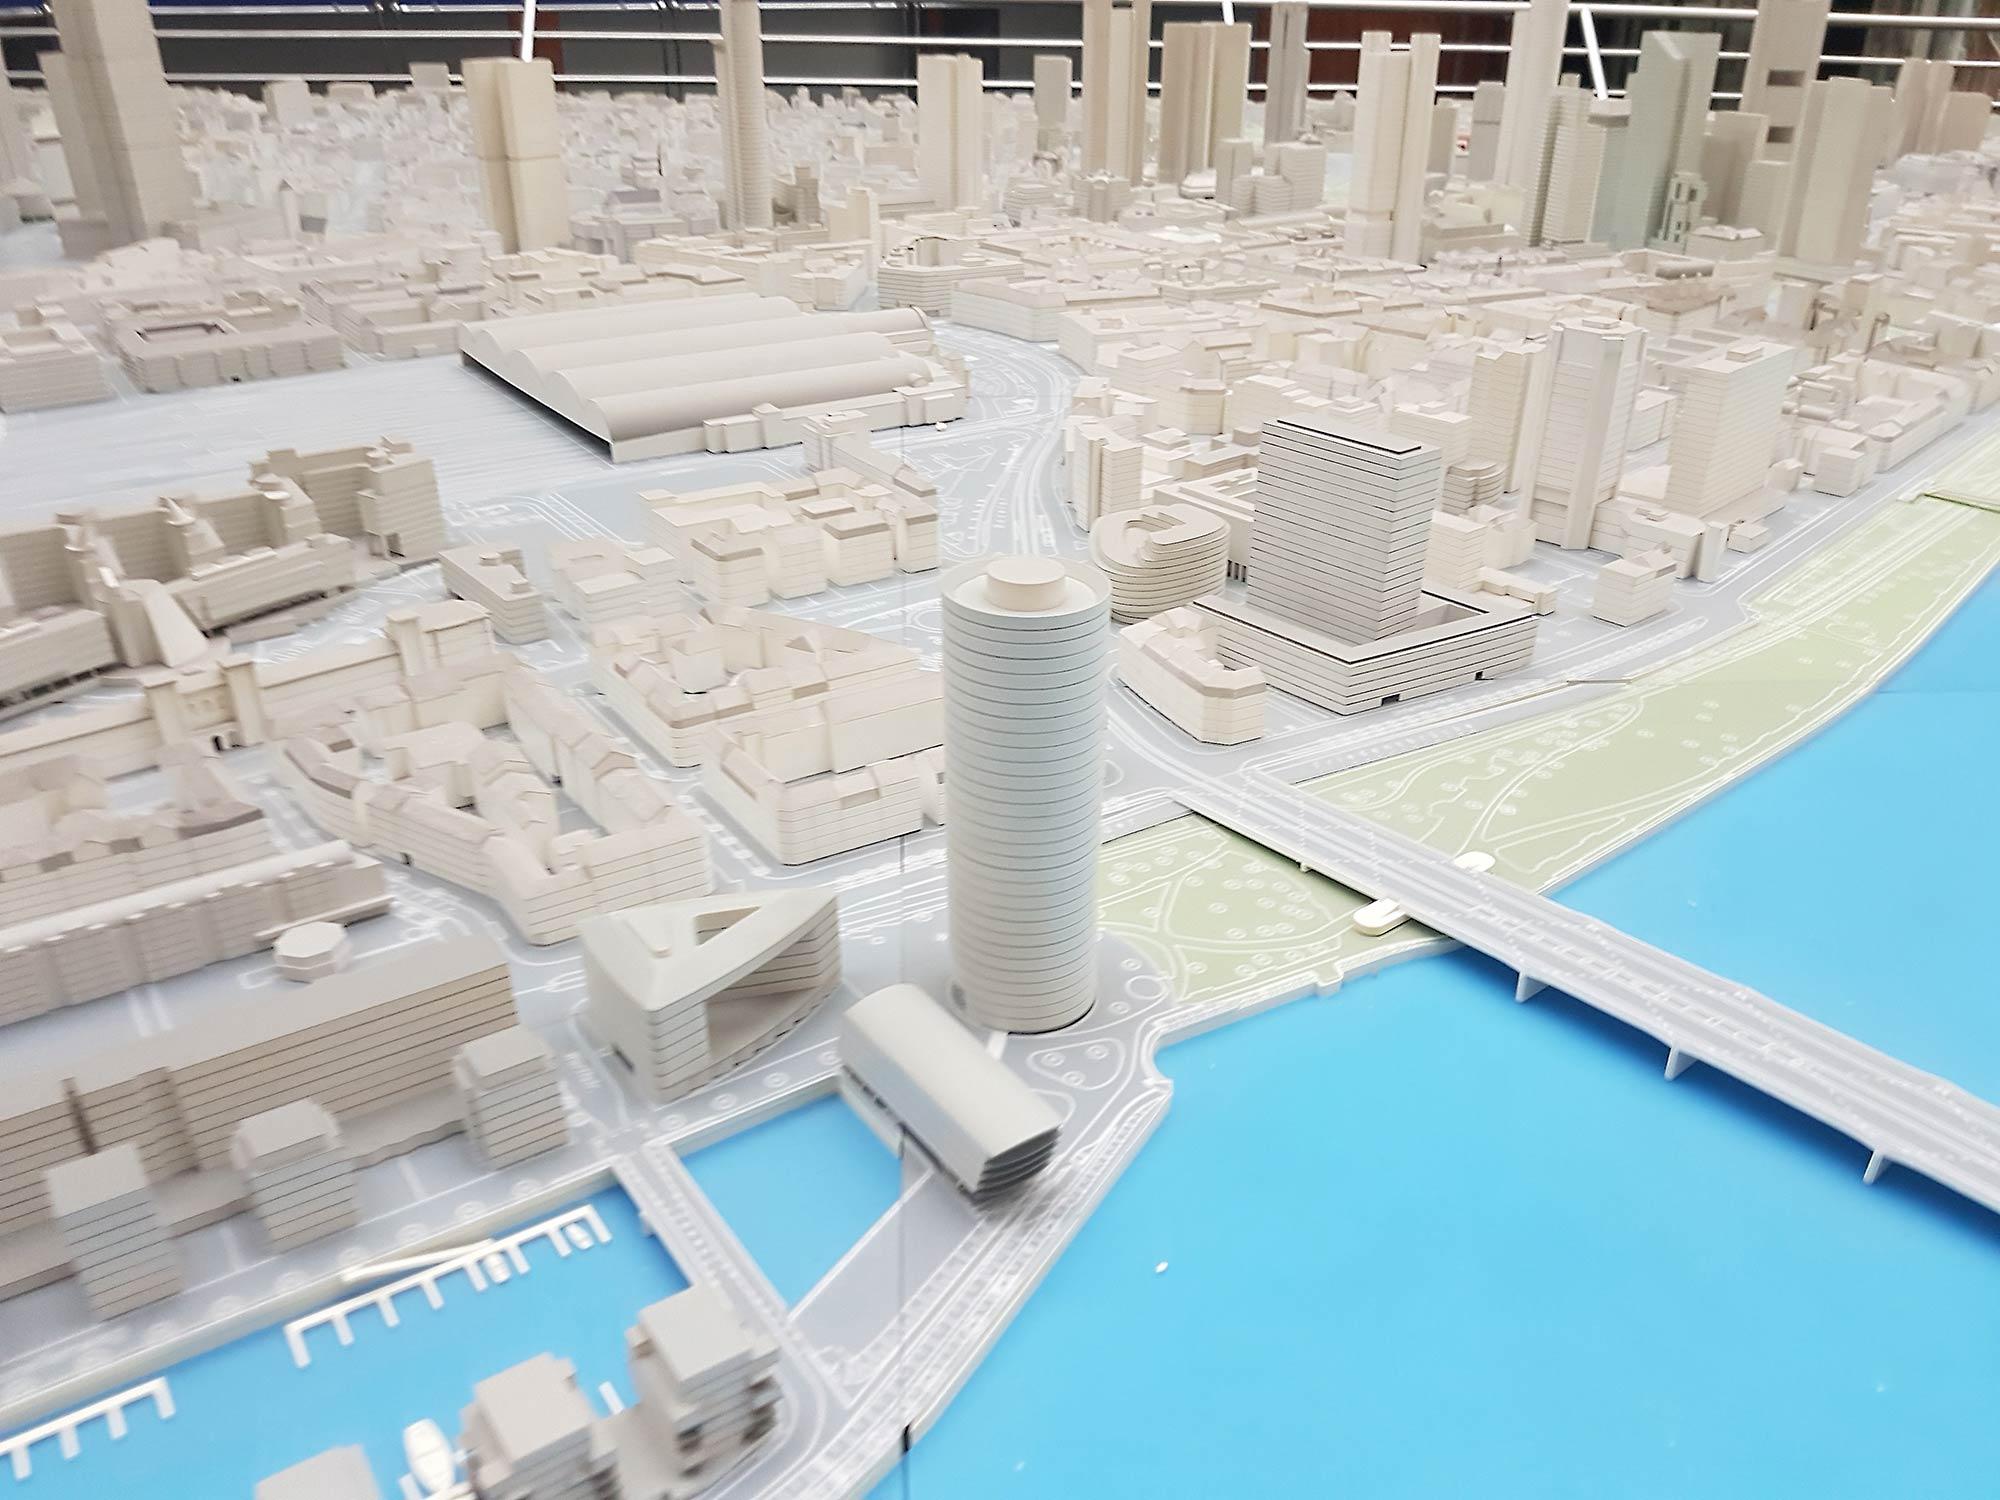 Neubauten am Westhafen Frankfurt - Stadtmodell Frankfurt - Architektur Frankfurt - Ebbelwoi Glas